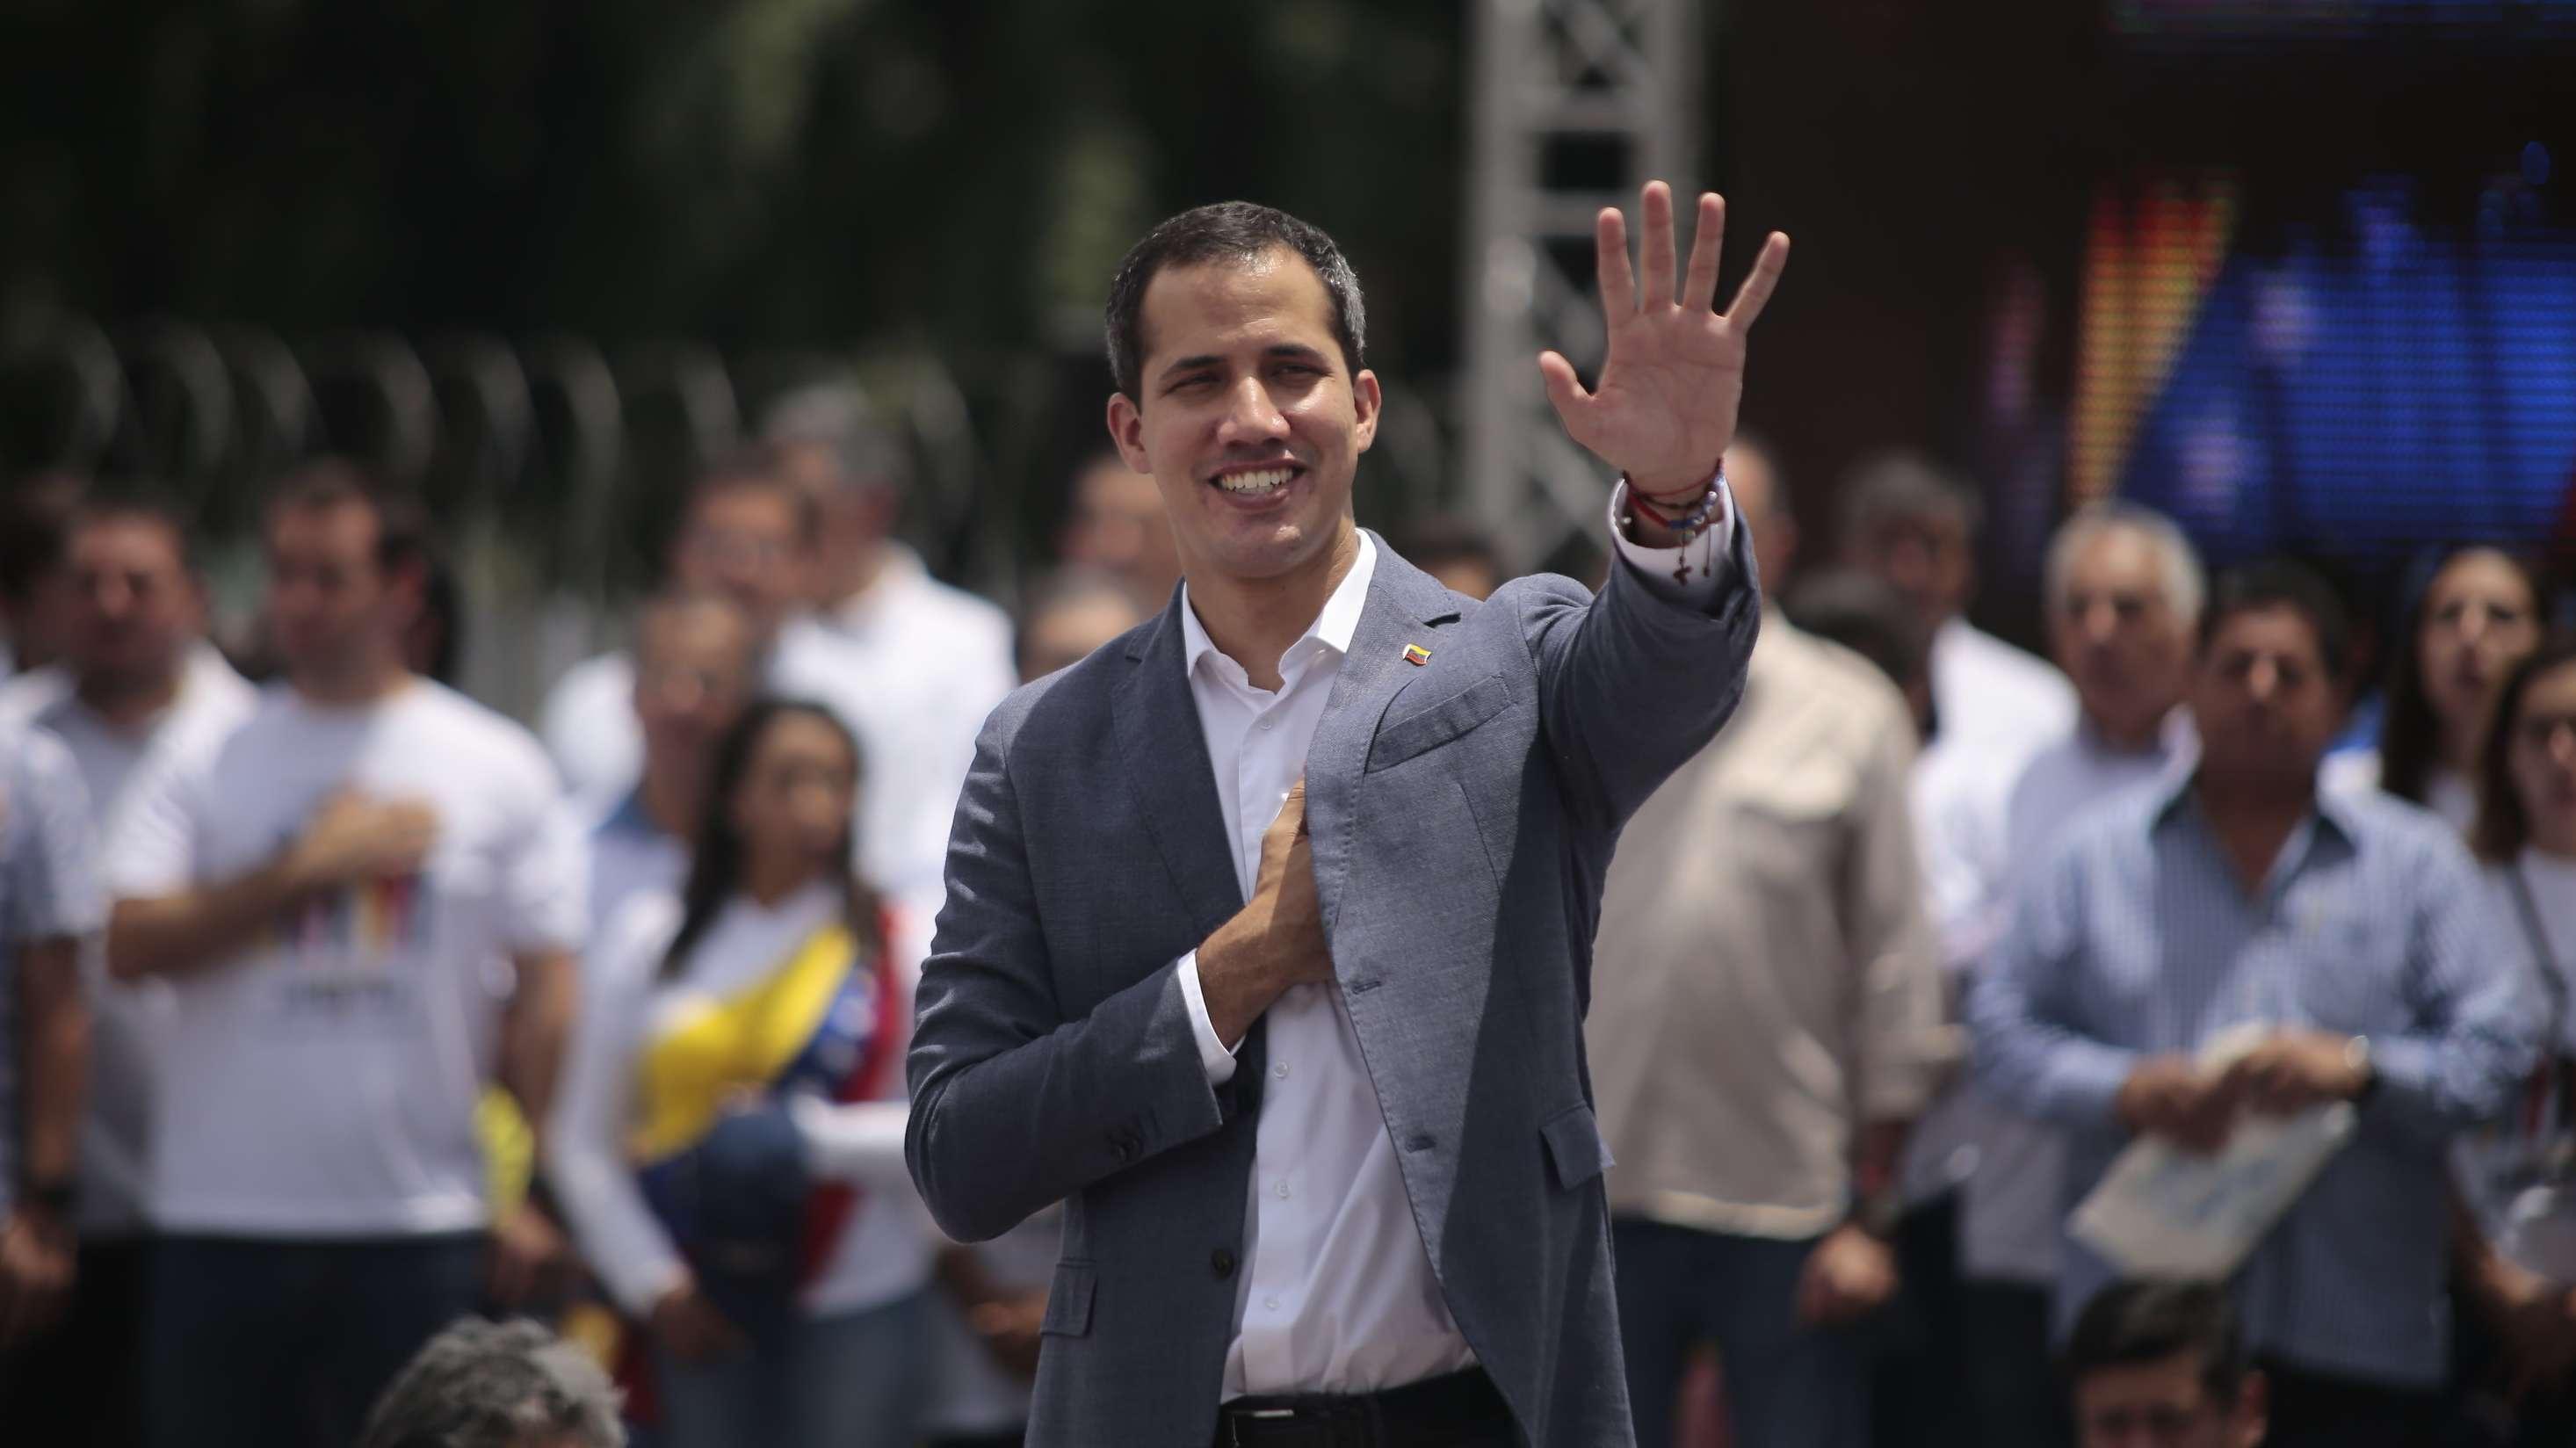 Juan Guaido bei einer Kundgebung in Caracas am 27.4.